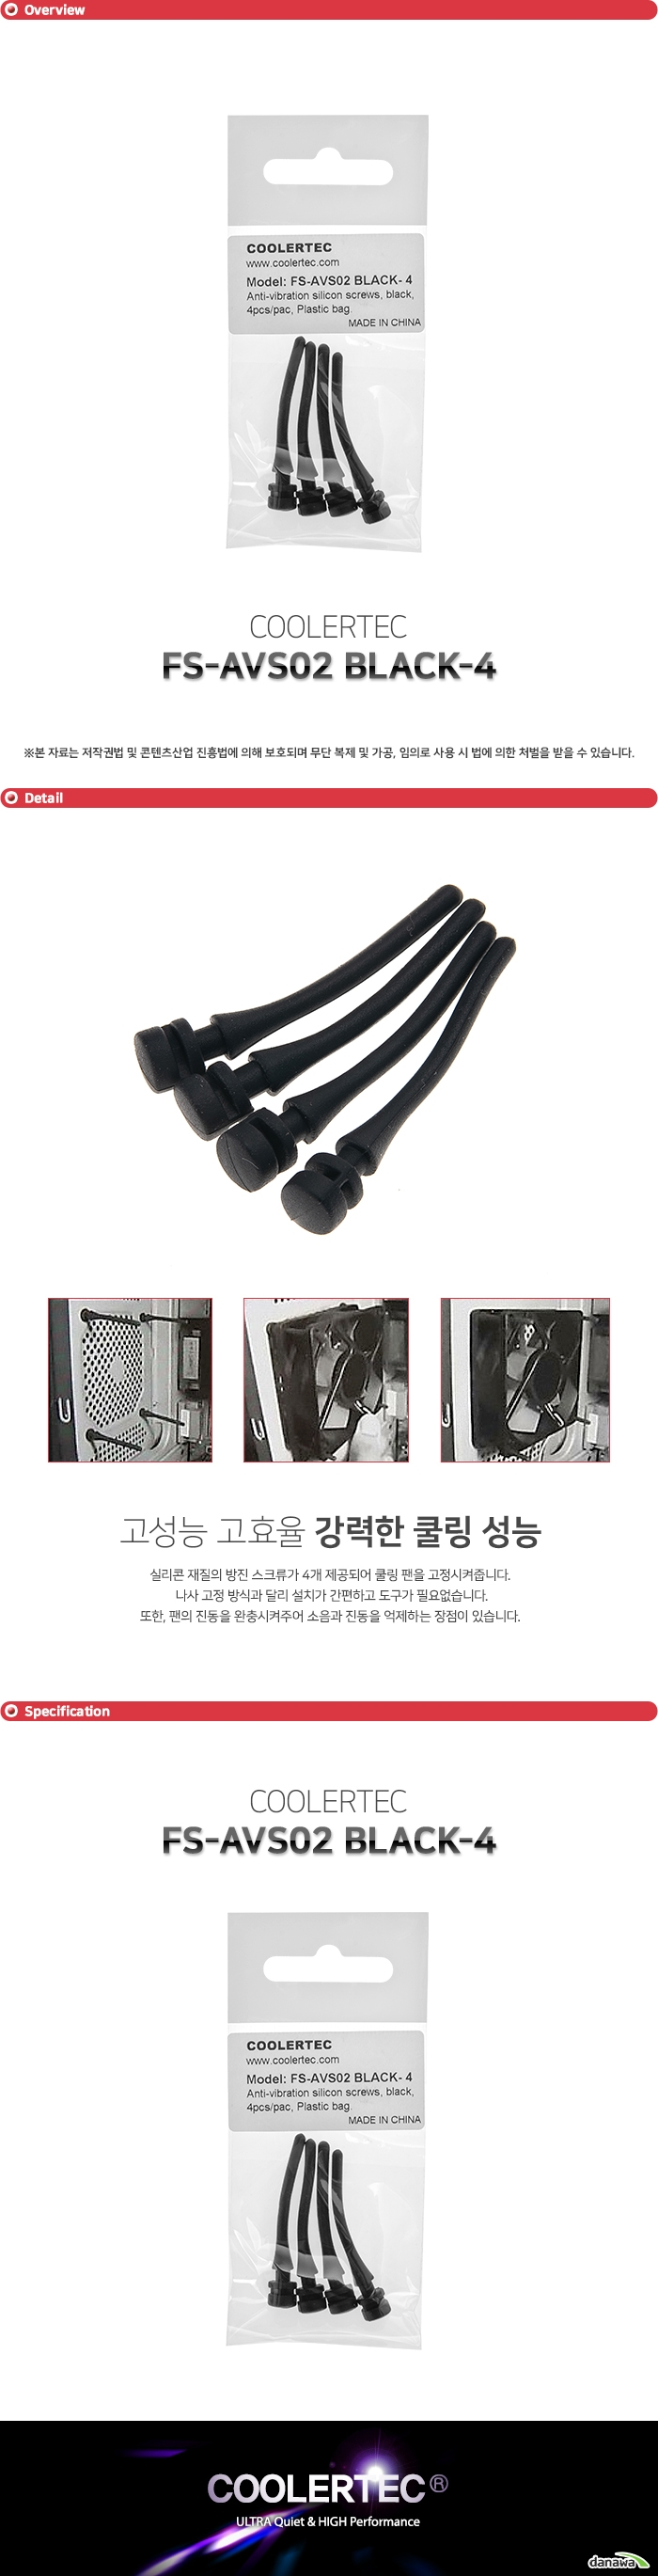 COOLERTEC FS-AVS02 BLACK-4